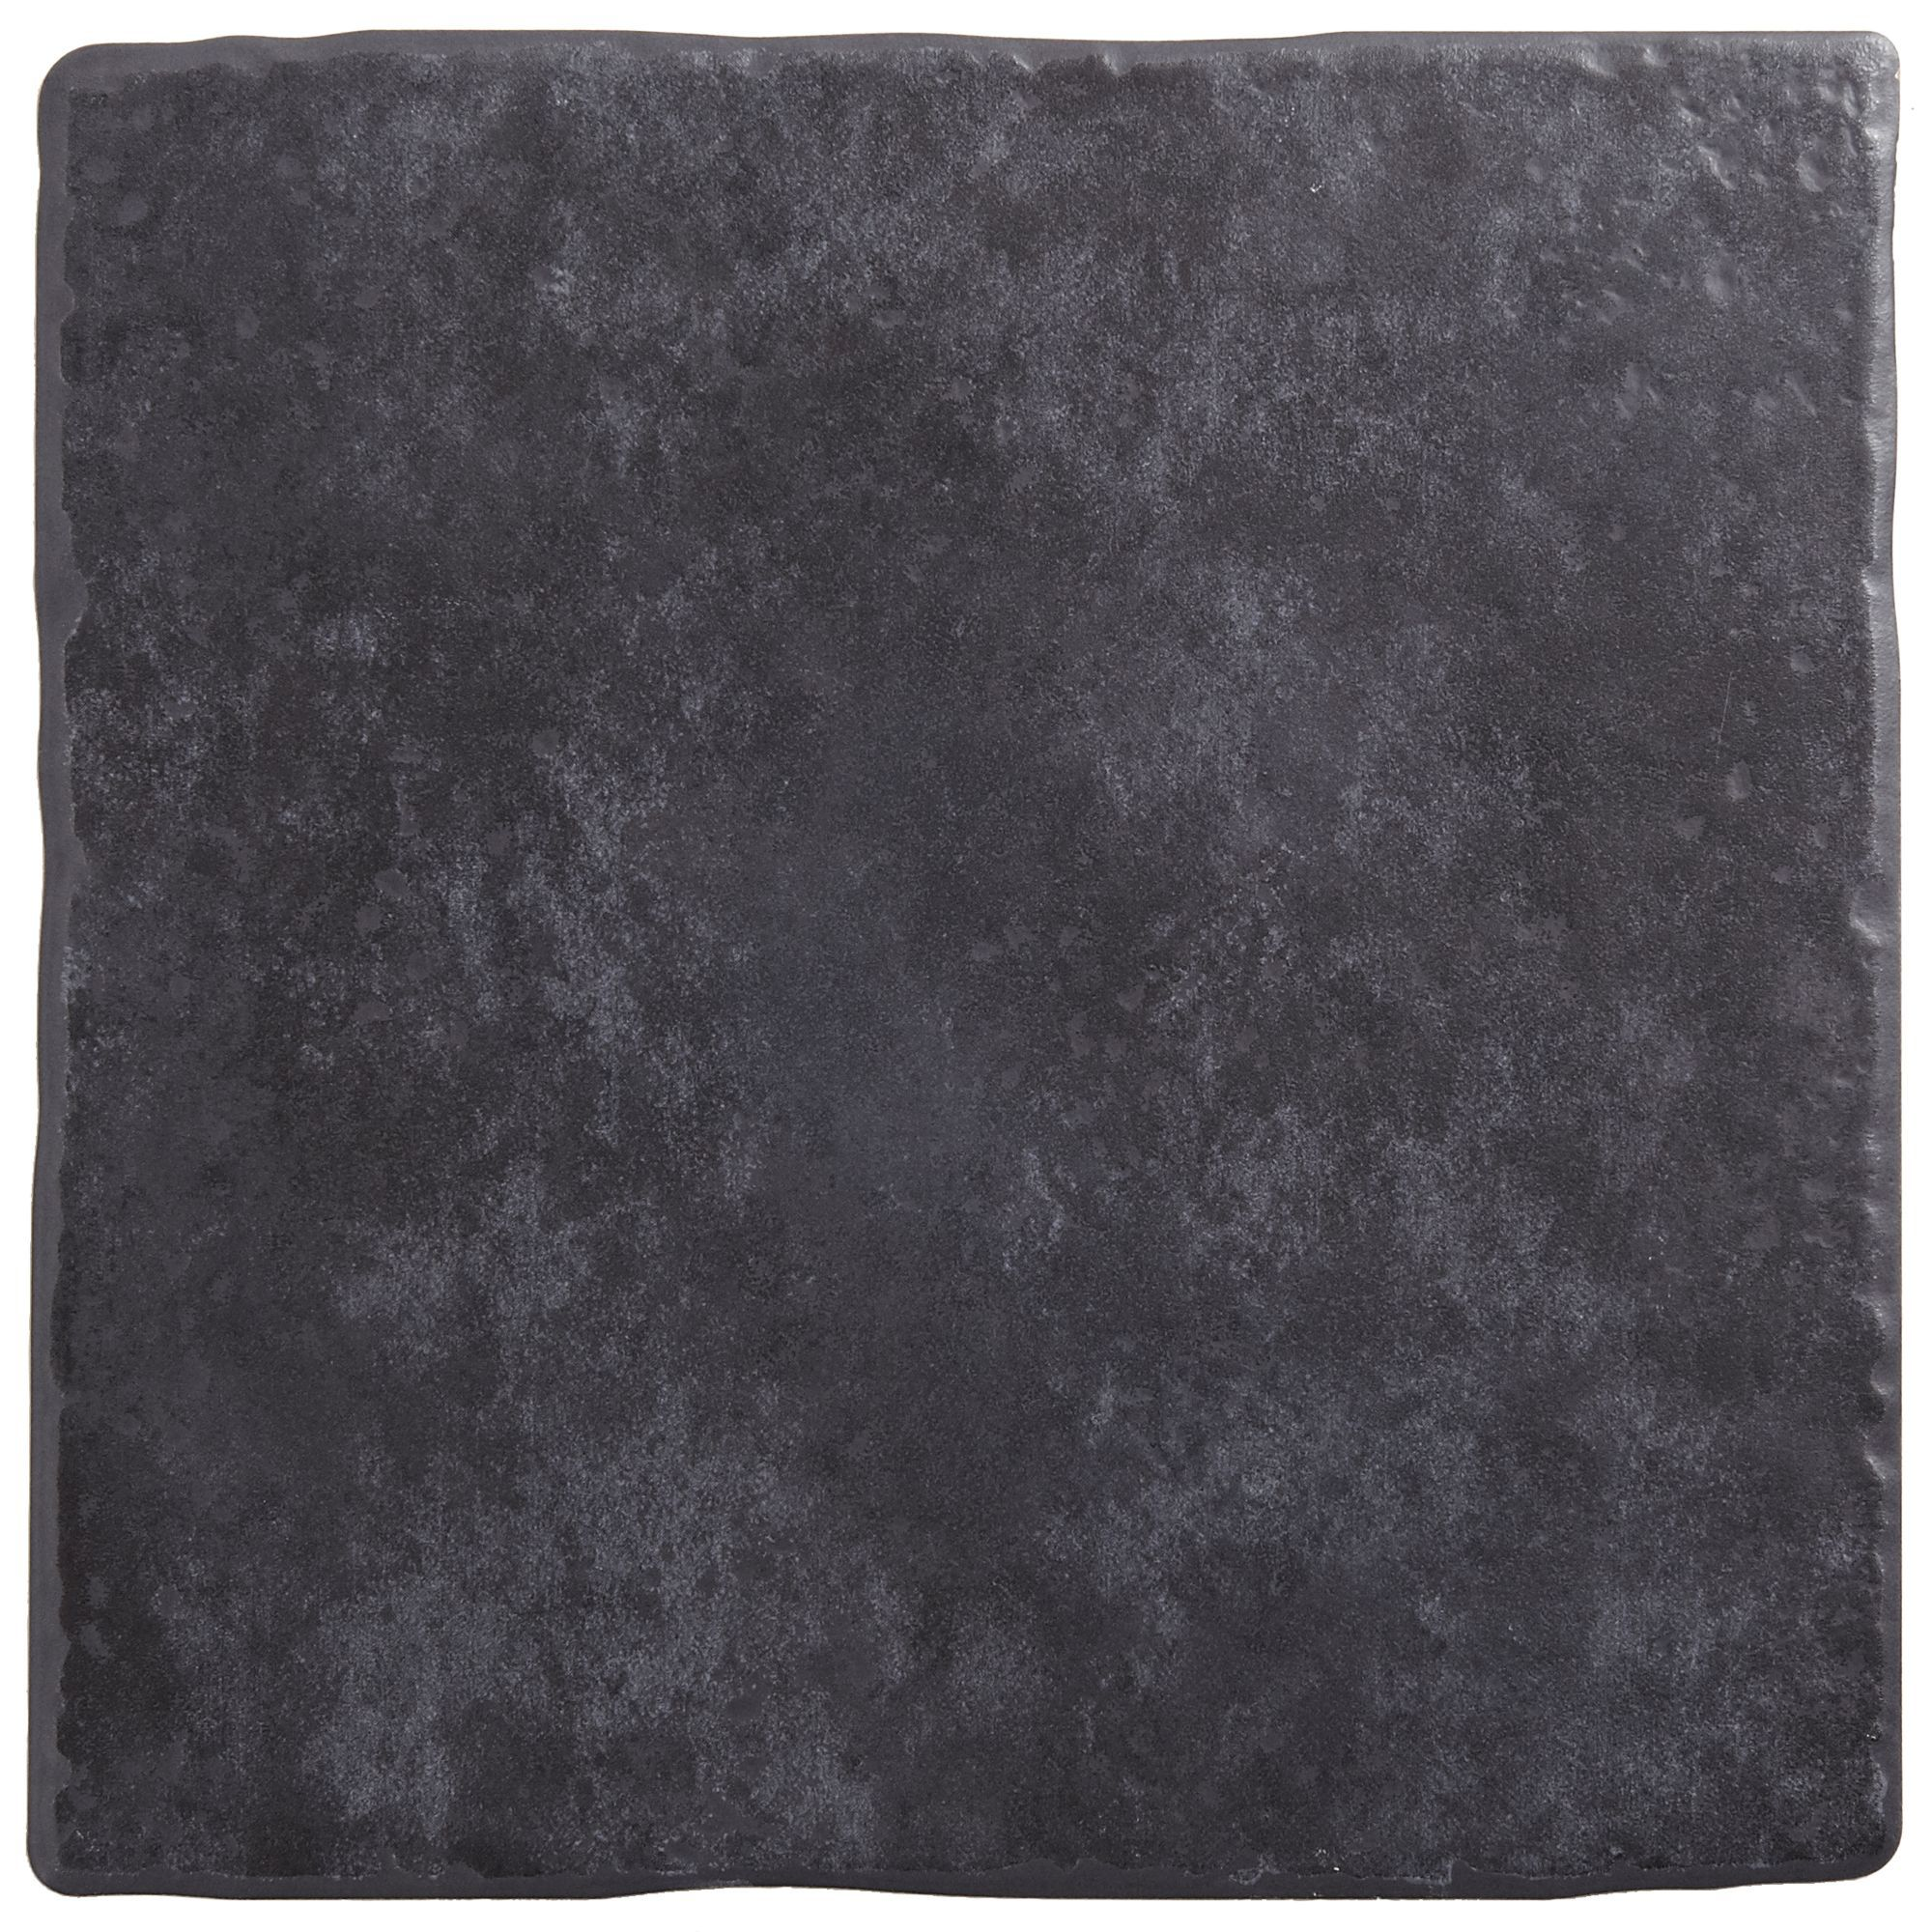 Diy at b q for Big black floor tiles